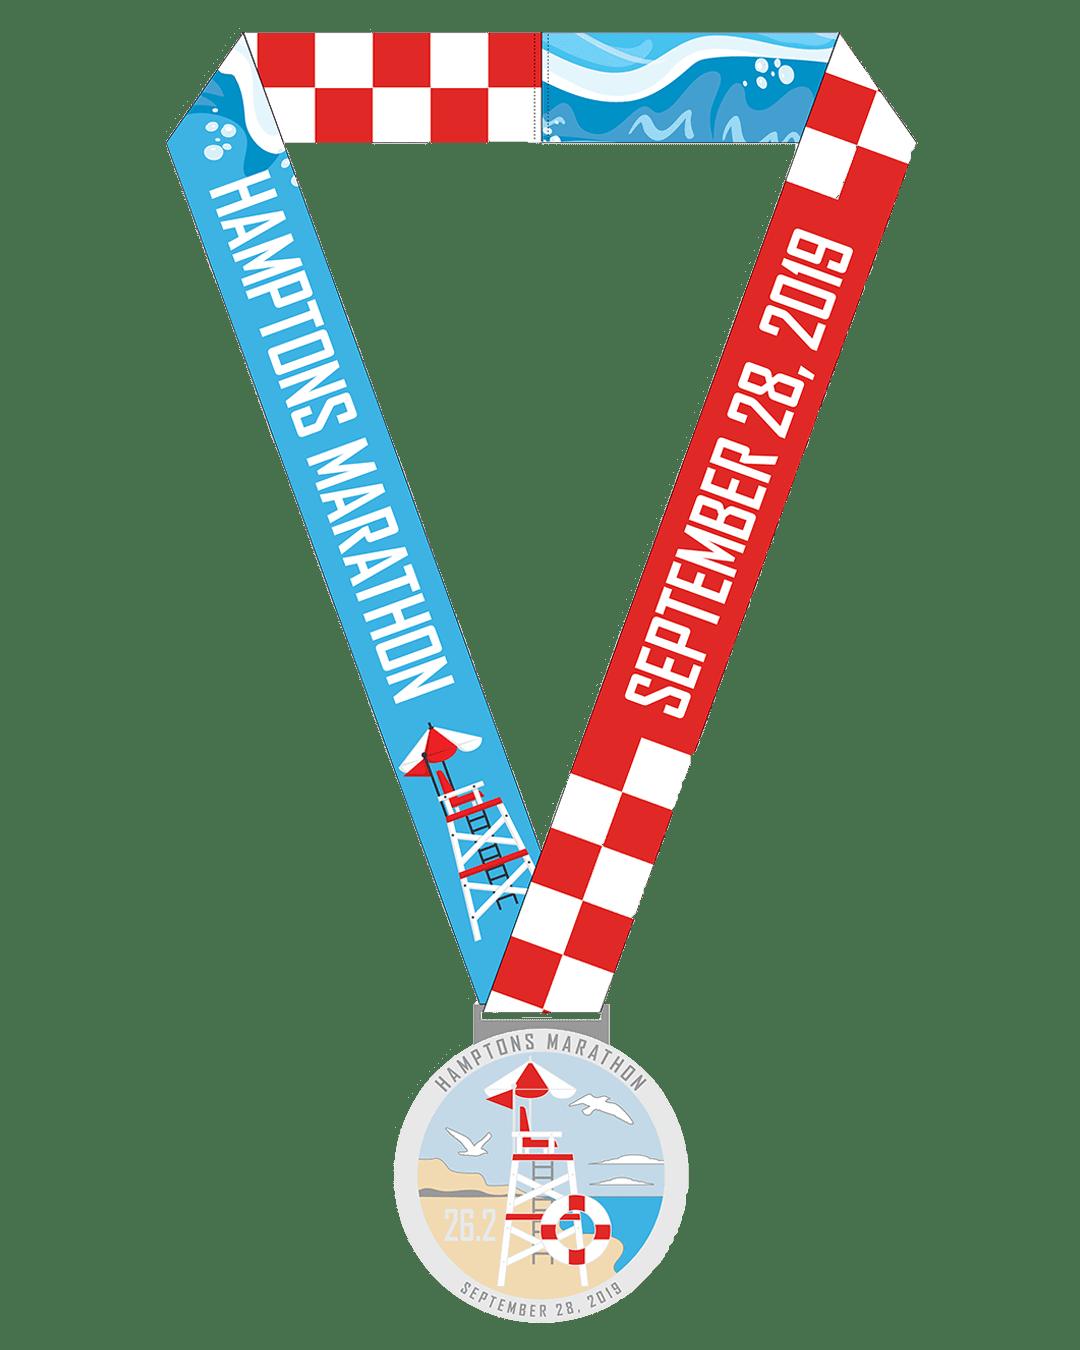 Hamptons Half Marathon Medal 2019